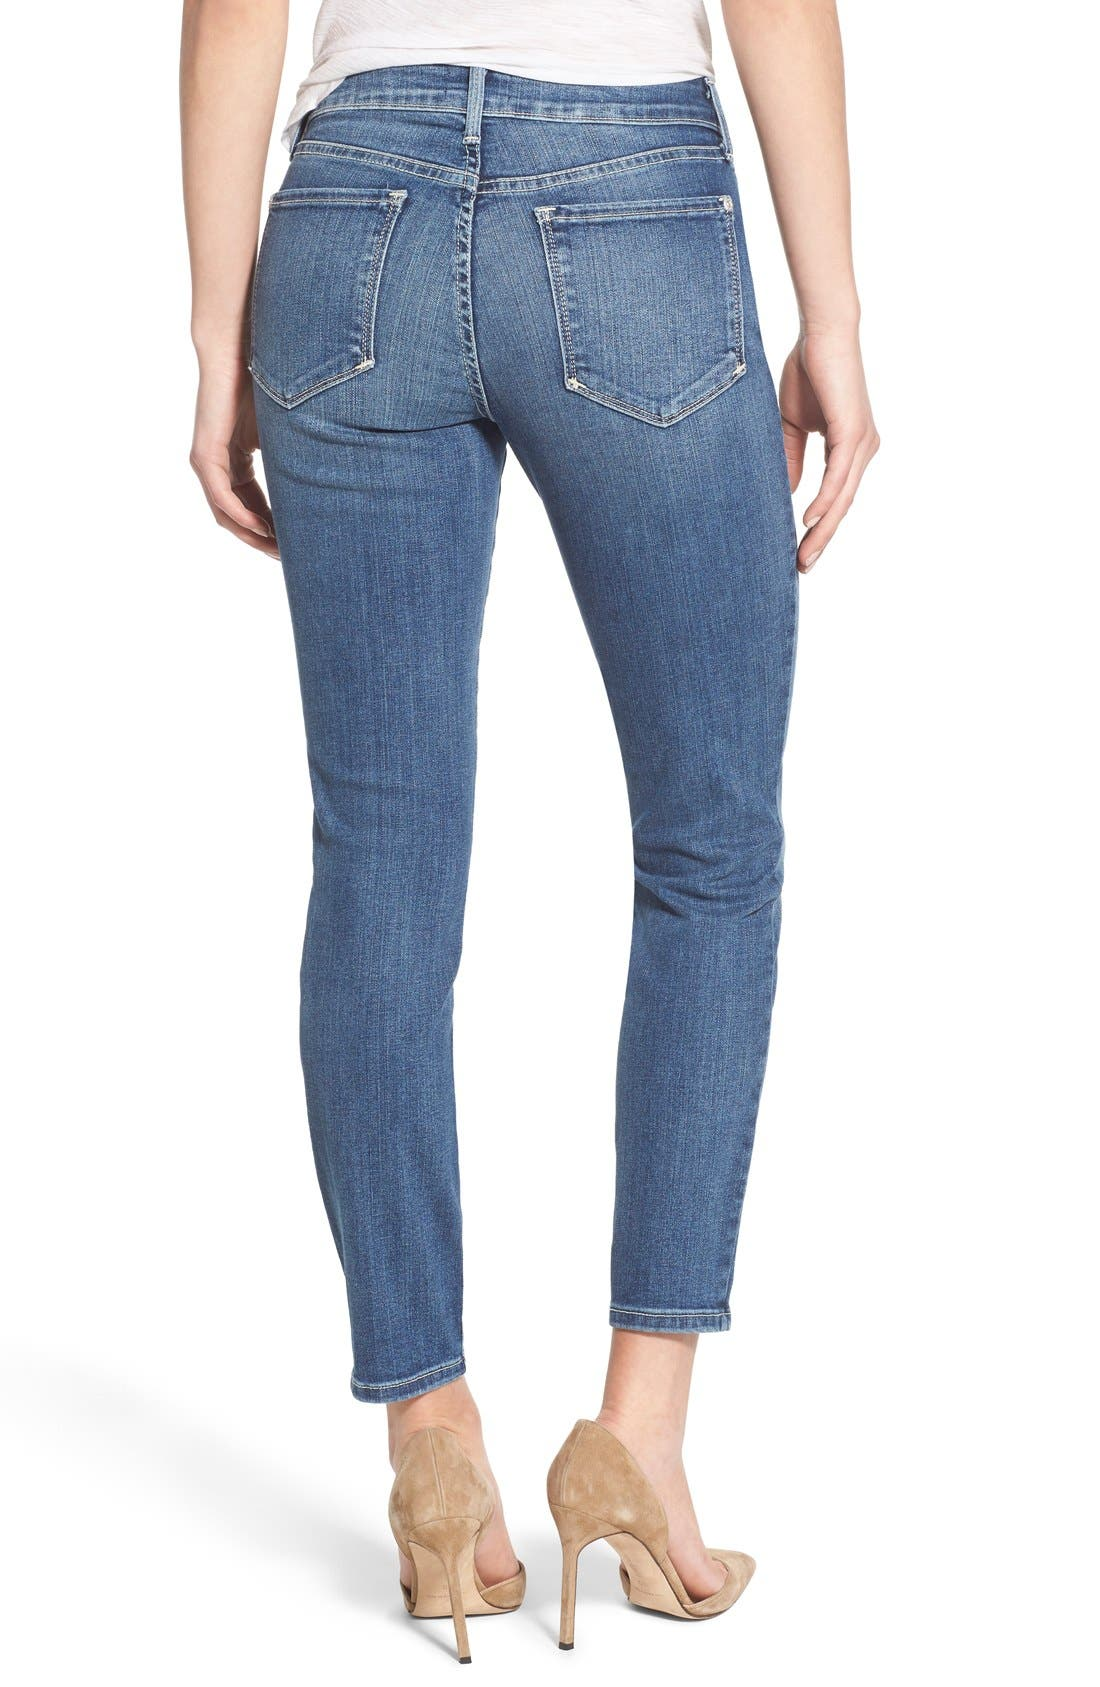 Alternate Image 2  - NYDJ 'Clarissa' Stretch Ankle Skinny Jeans (Heyburn) (Regular & Petite)